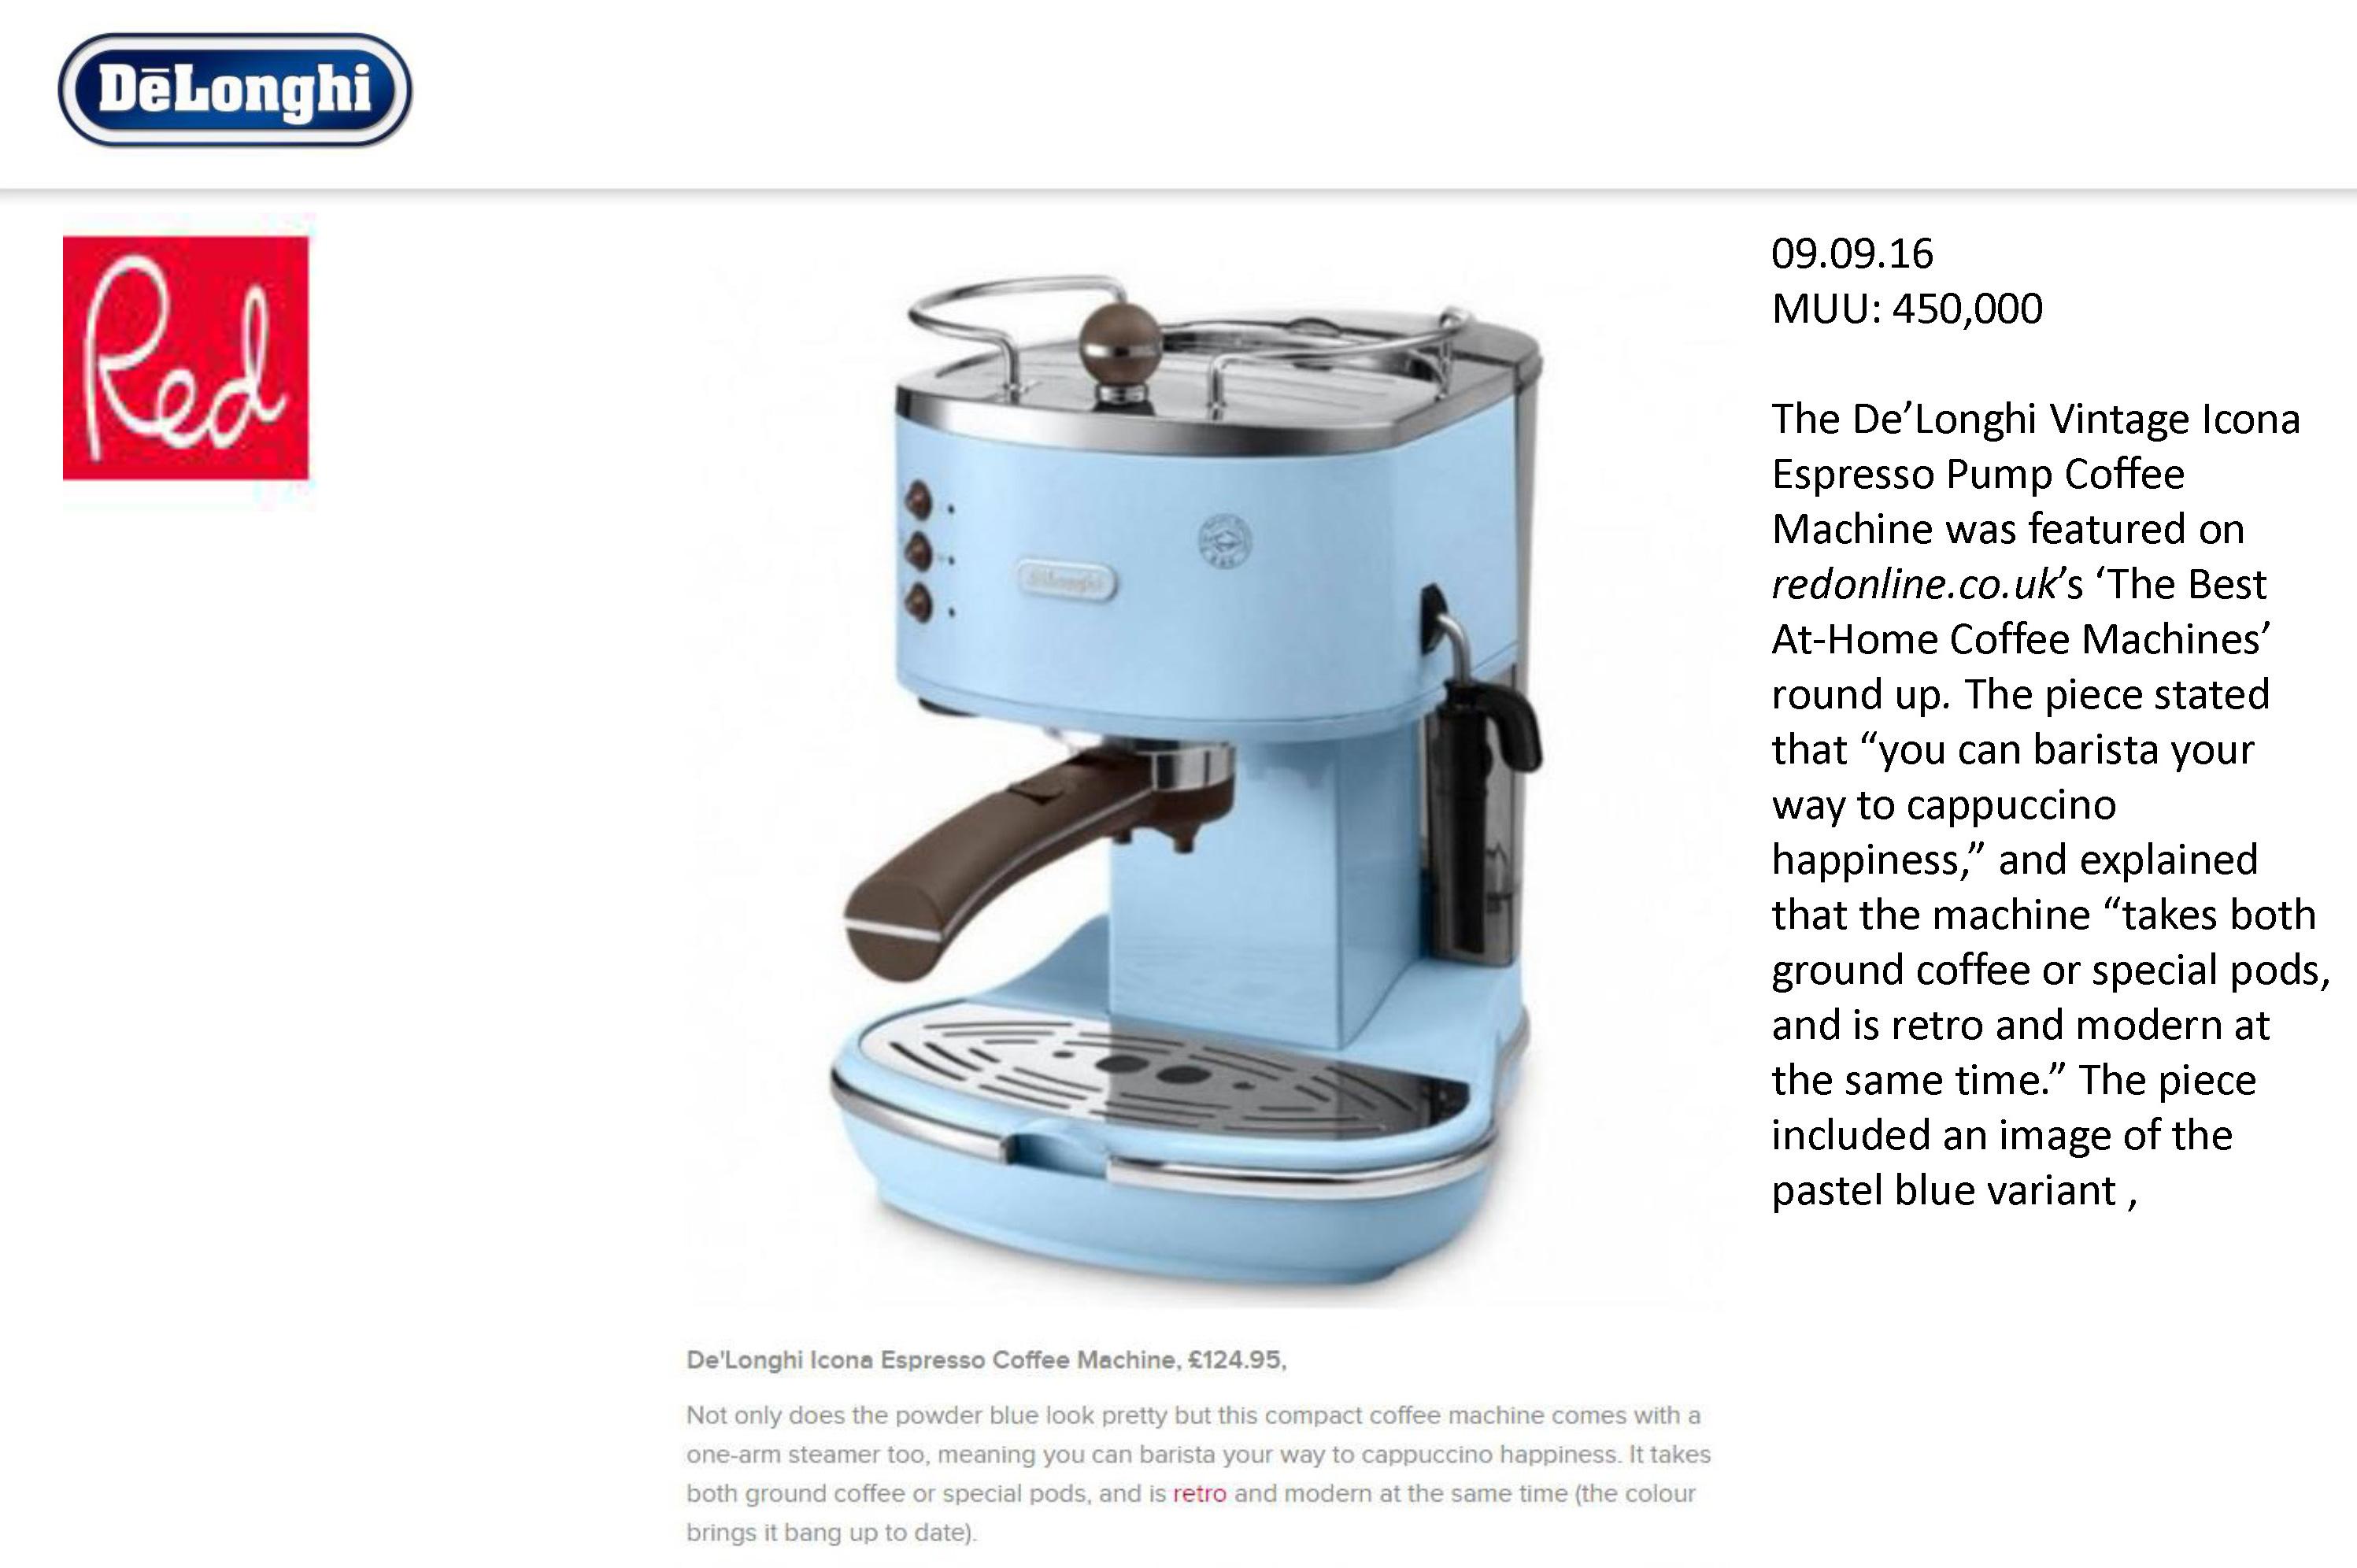 Vintage Icona Espresso Machine Redline Co Uk